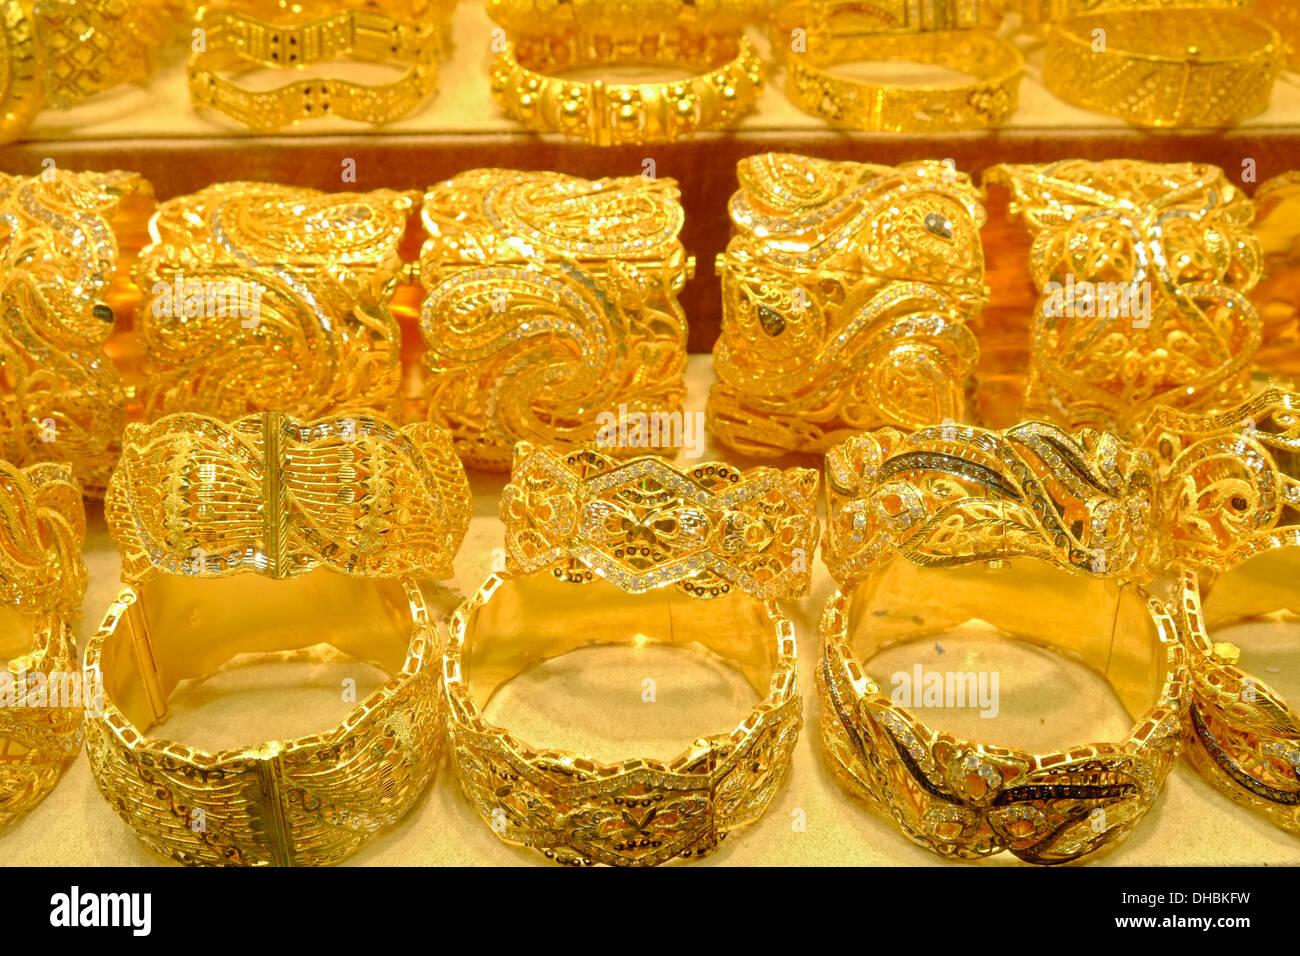 Gold bracelets jewelery for sale in shop in Gold Souk in